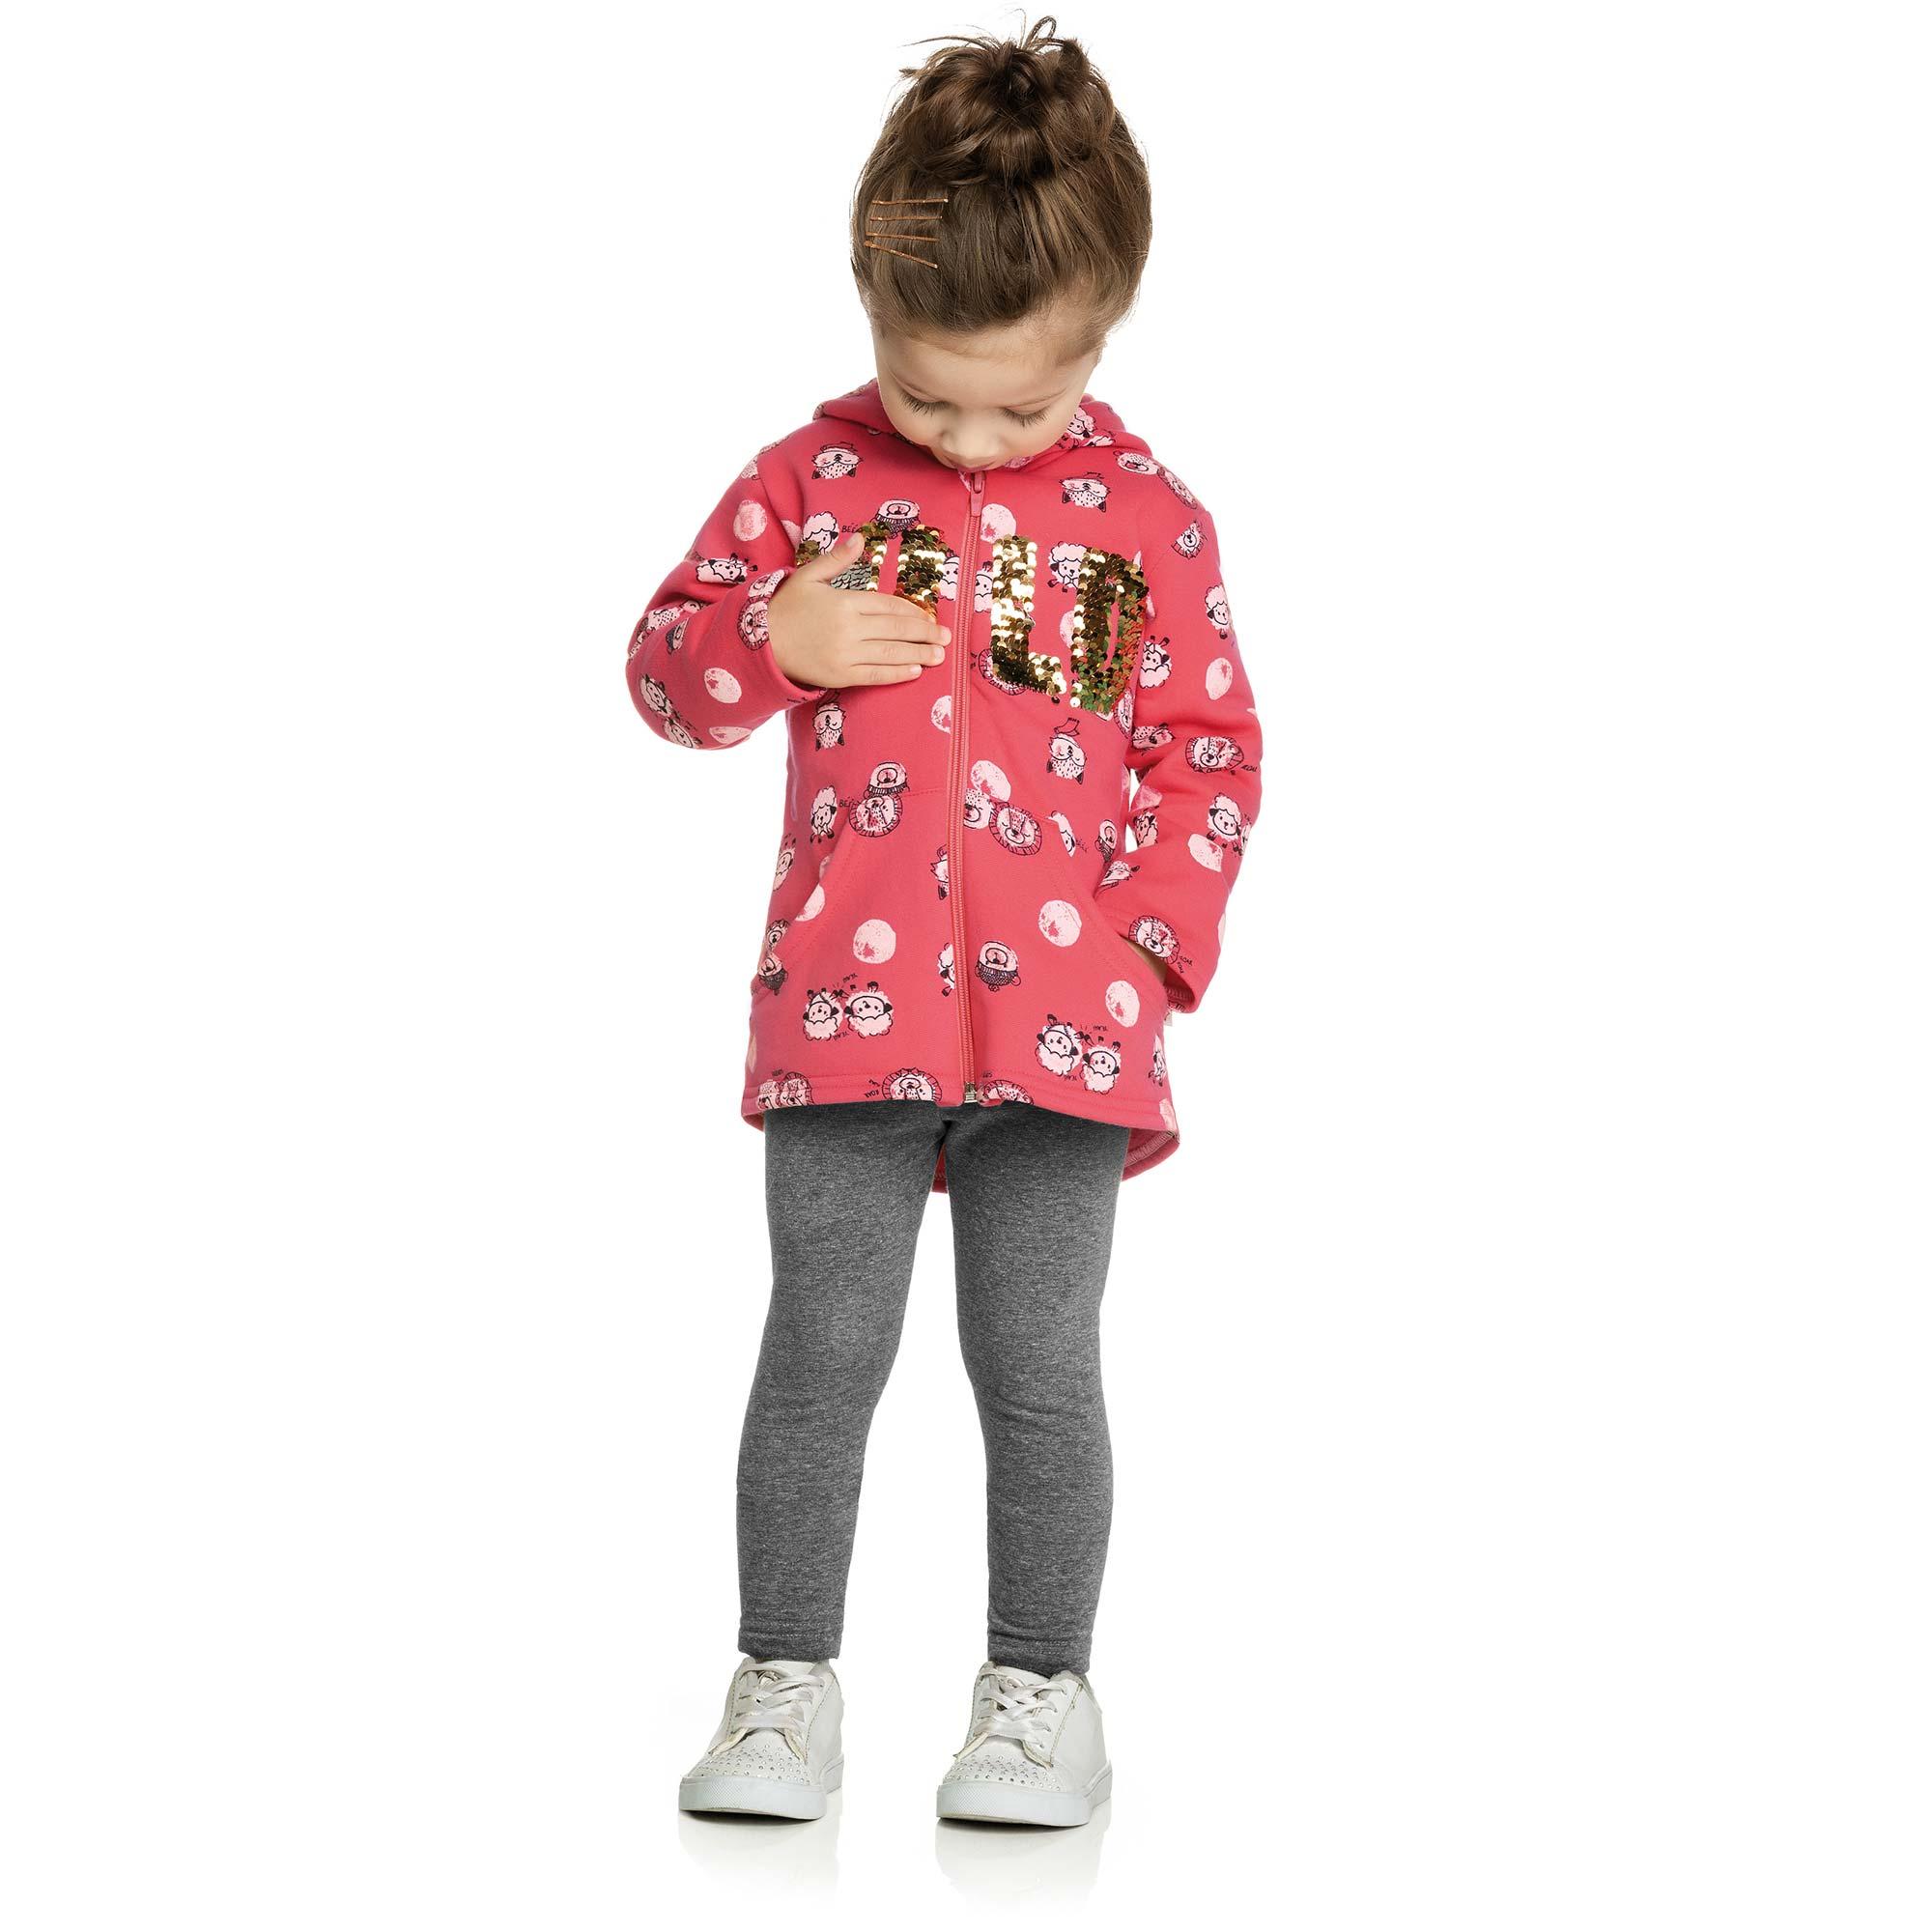 Conjunto Infantil Elian com Casaco e Legging - Ref 231160 - Goiaba